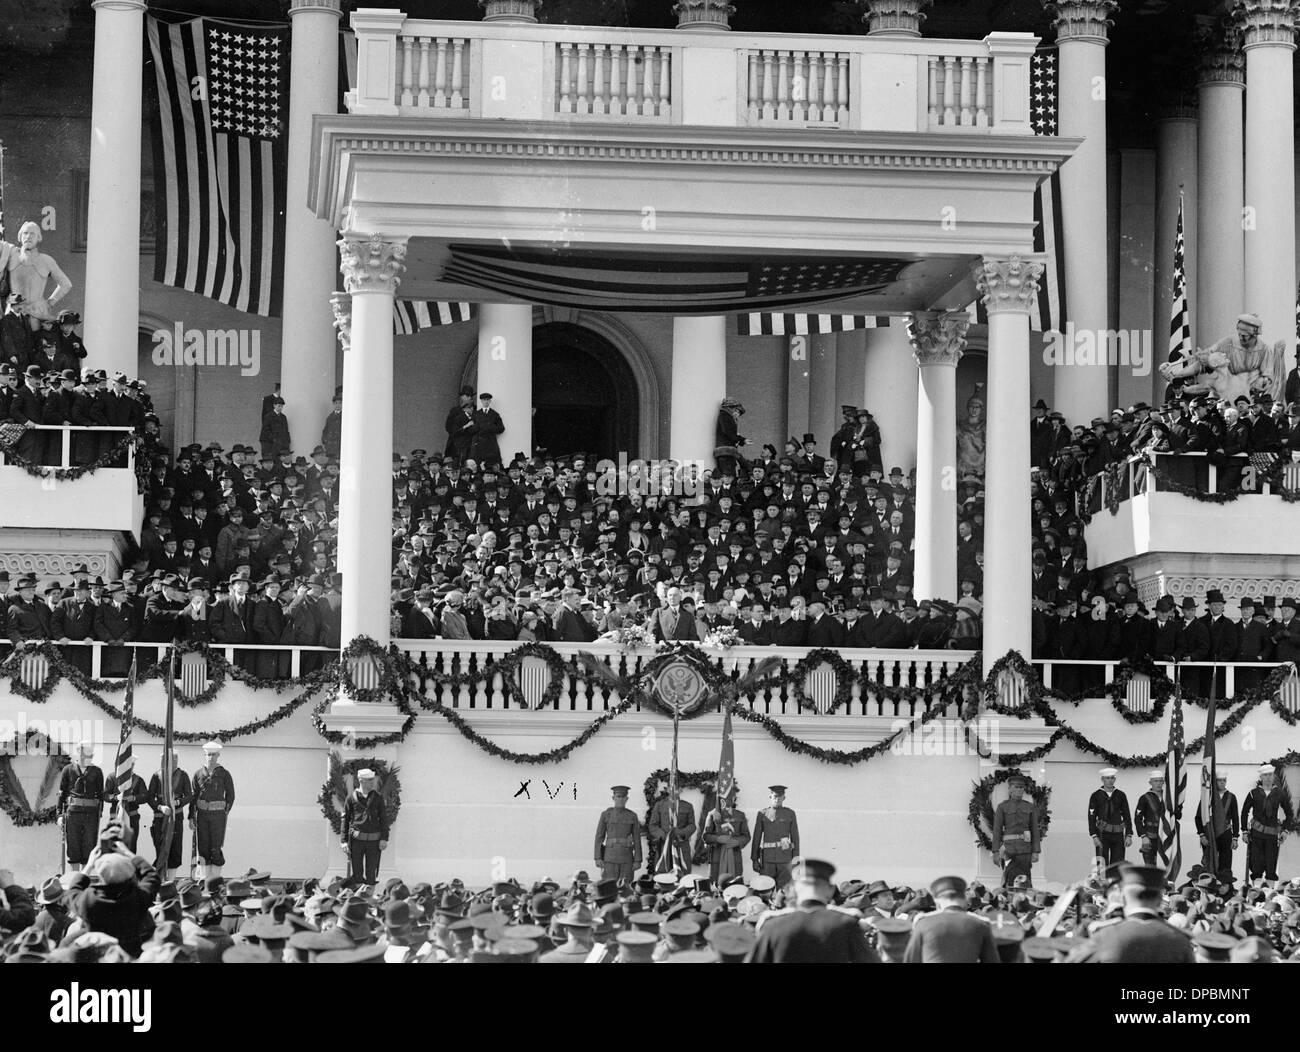 Warren G Harding Inauguration, March 4, 1921 - Stock Image